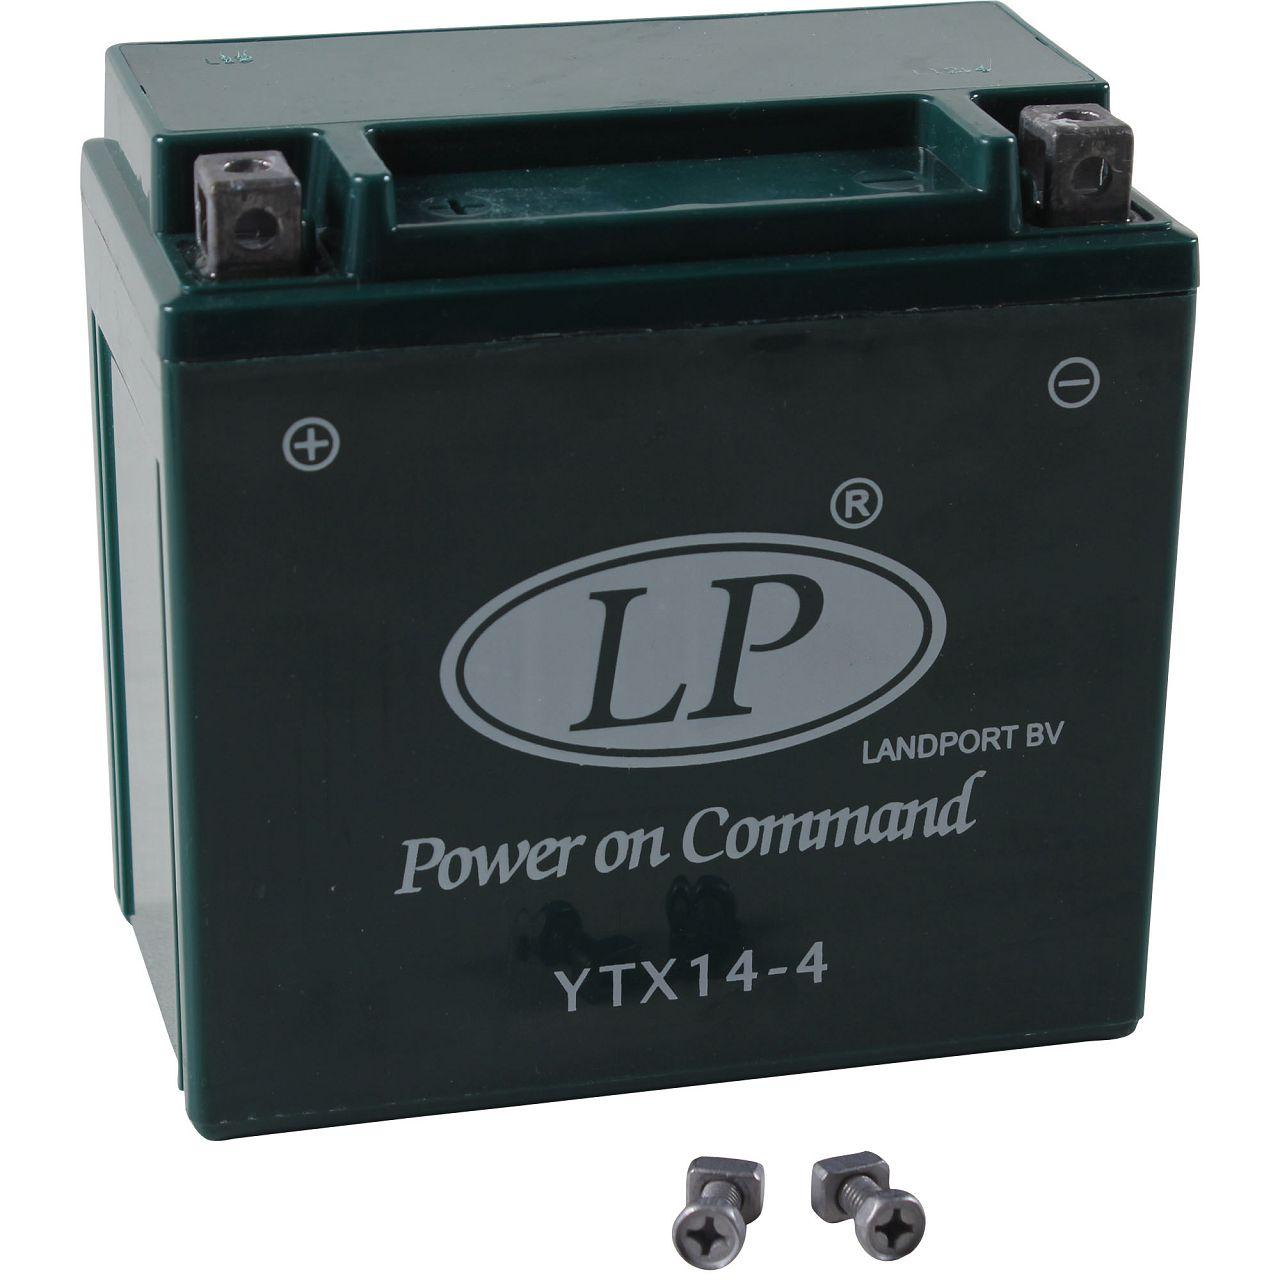 Versorgungsbatterie 12V 12Ah für MERCEDES W169 W245 W246 W204 W211 W212 R231